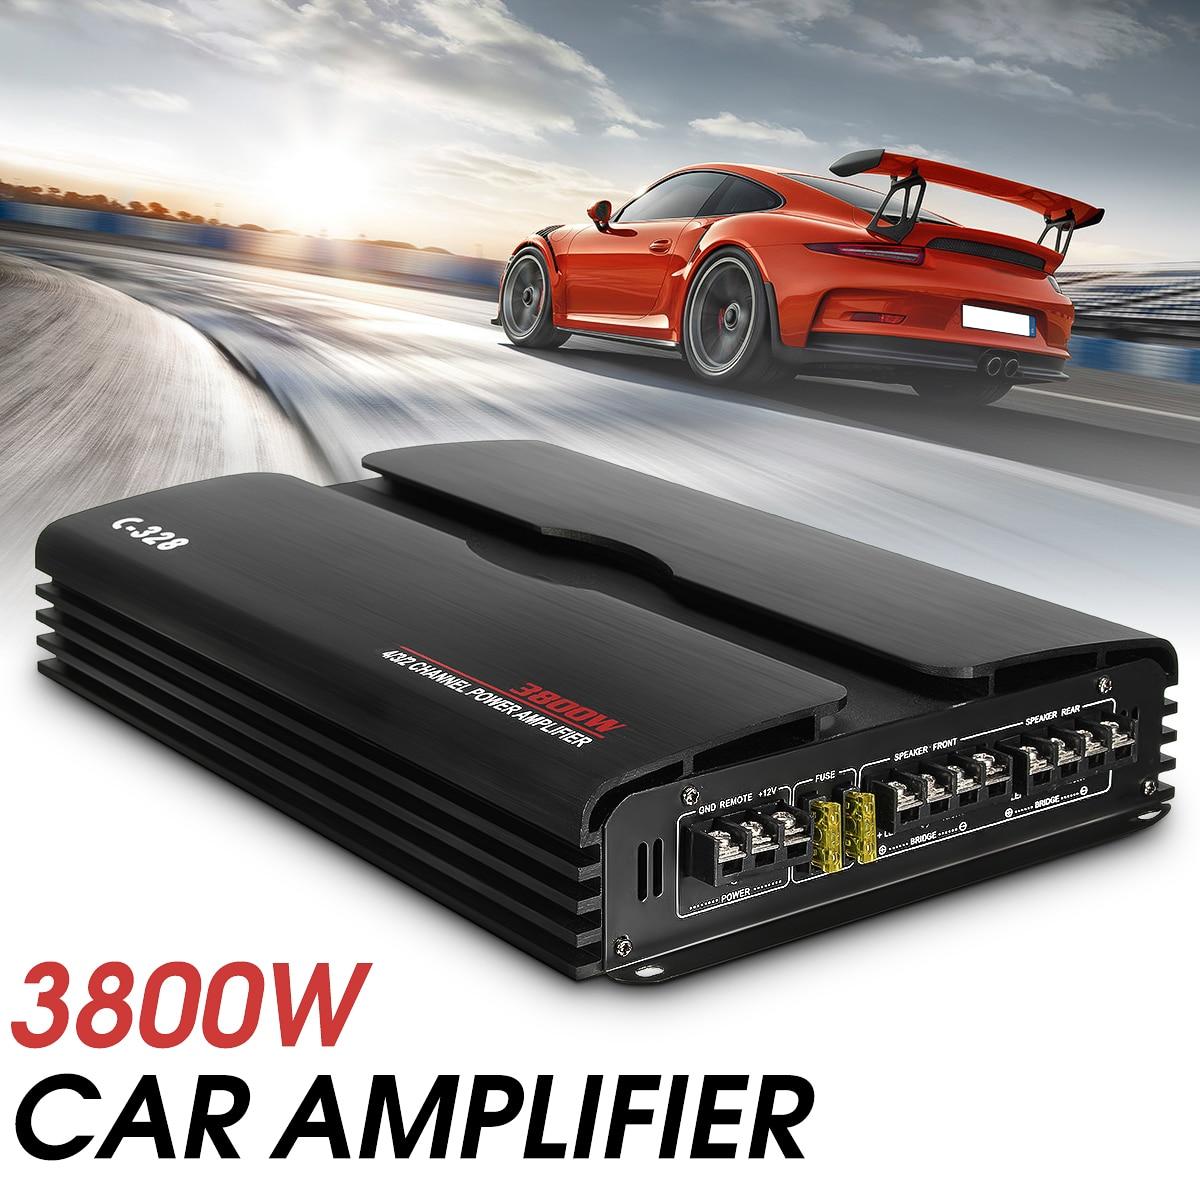 Car Amplifier Subwoofer 3800W RMS 4/3/2 Channel 12/24V Powerful 4ohm Truck Car Amplifier Audio Power Stereo Amp Speaker Black цены